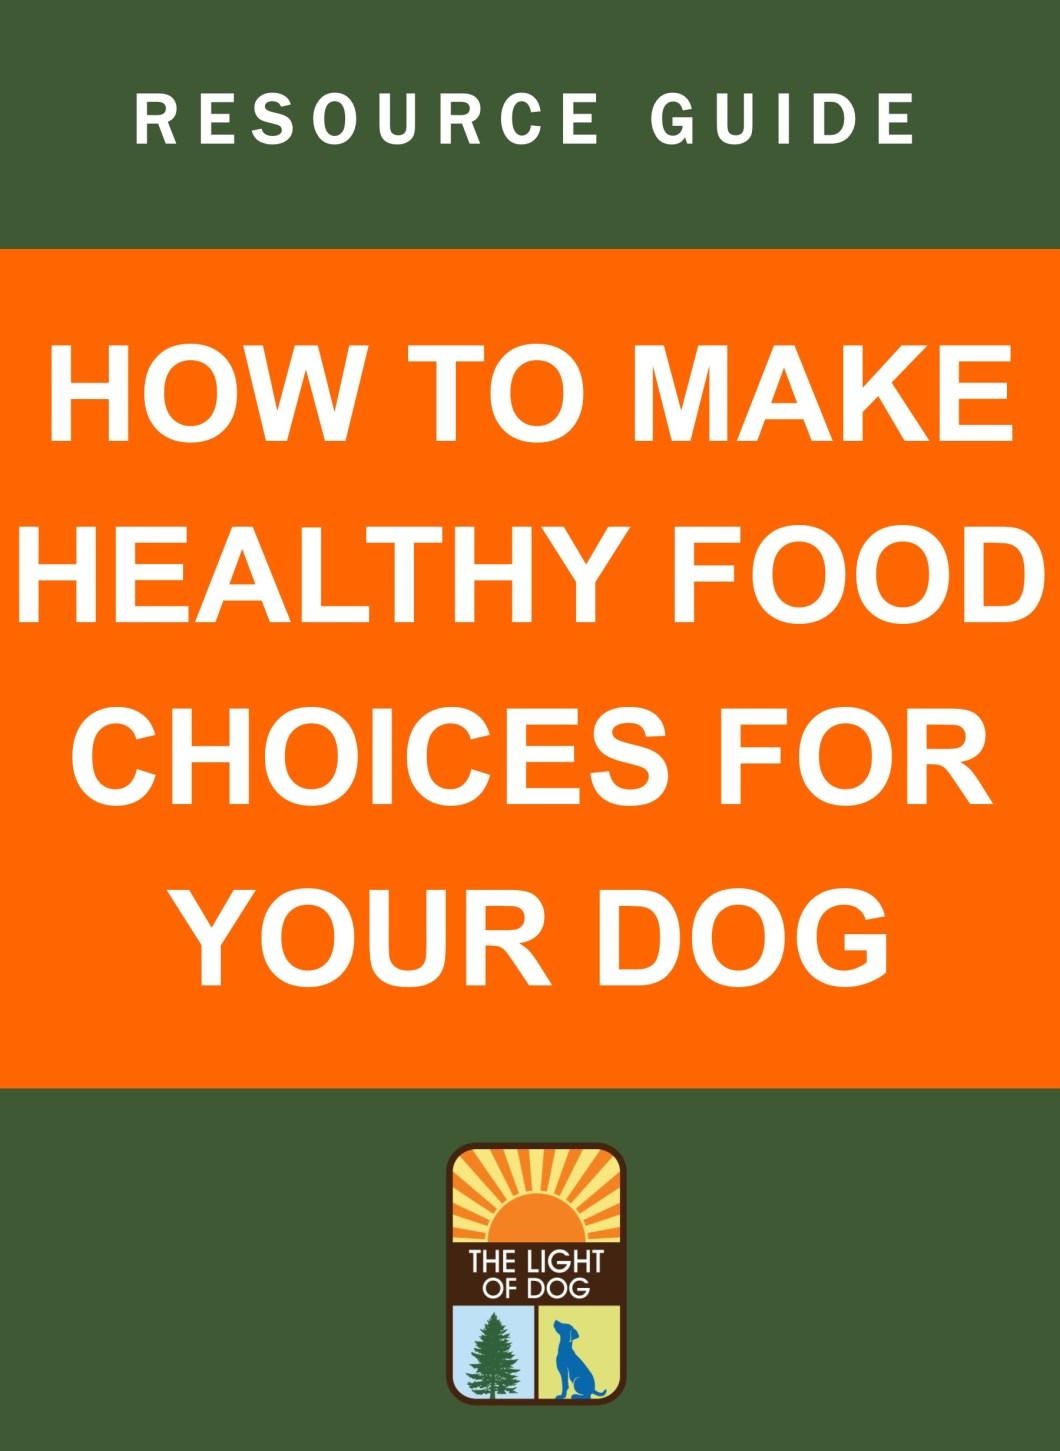 Buy healthy options dog food online